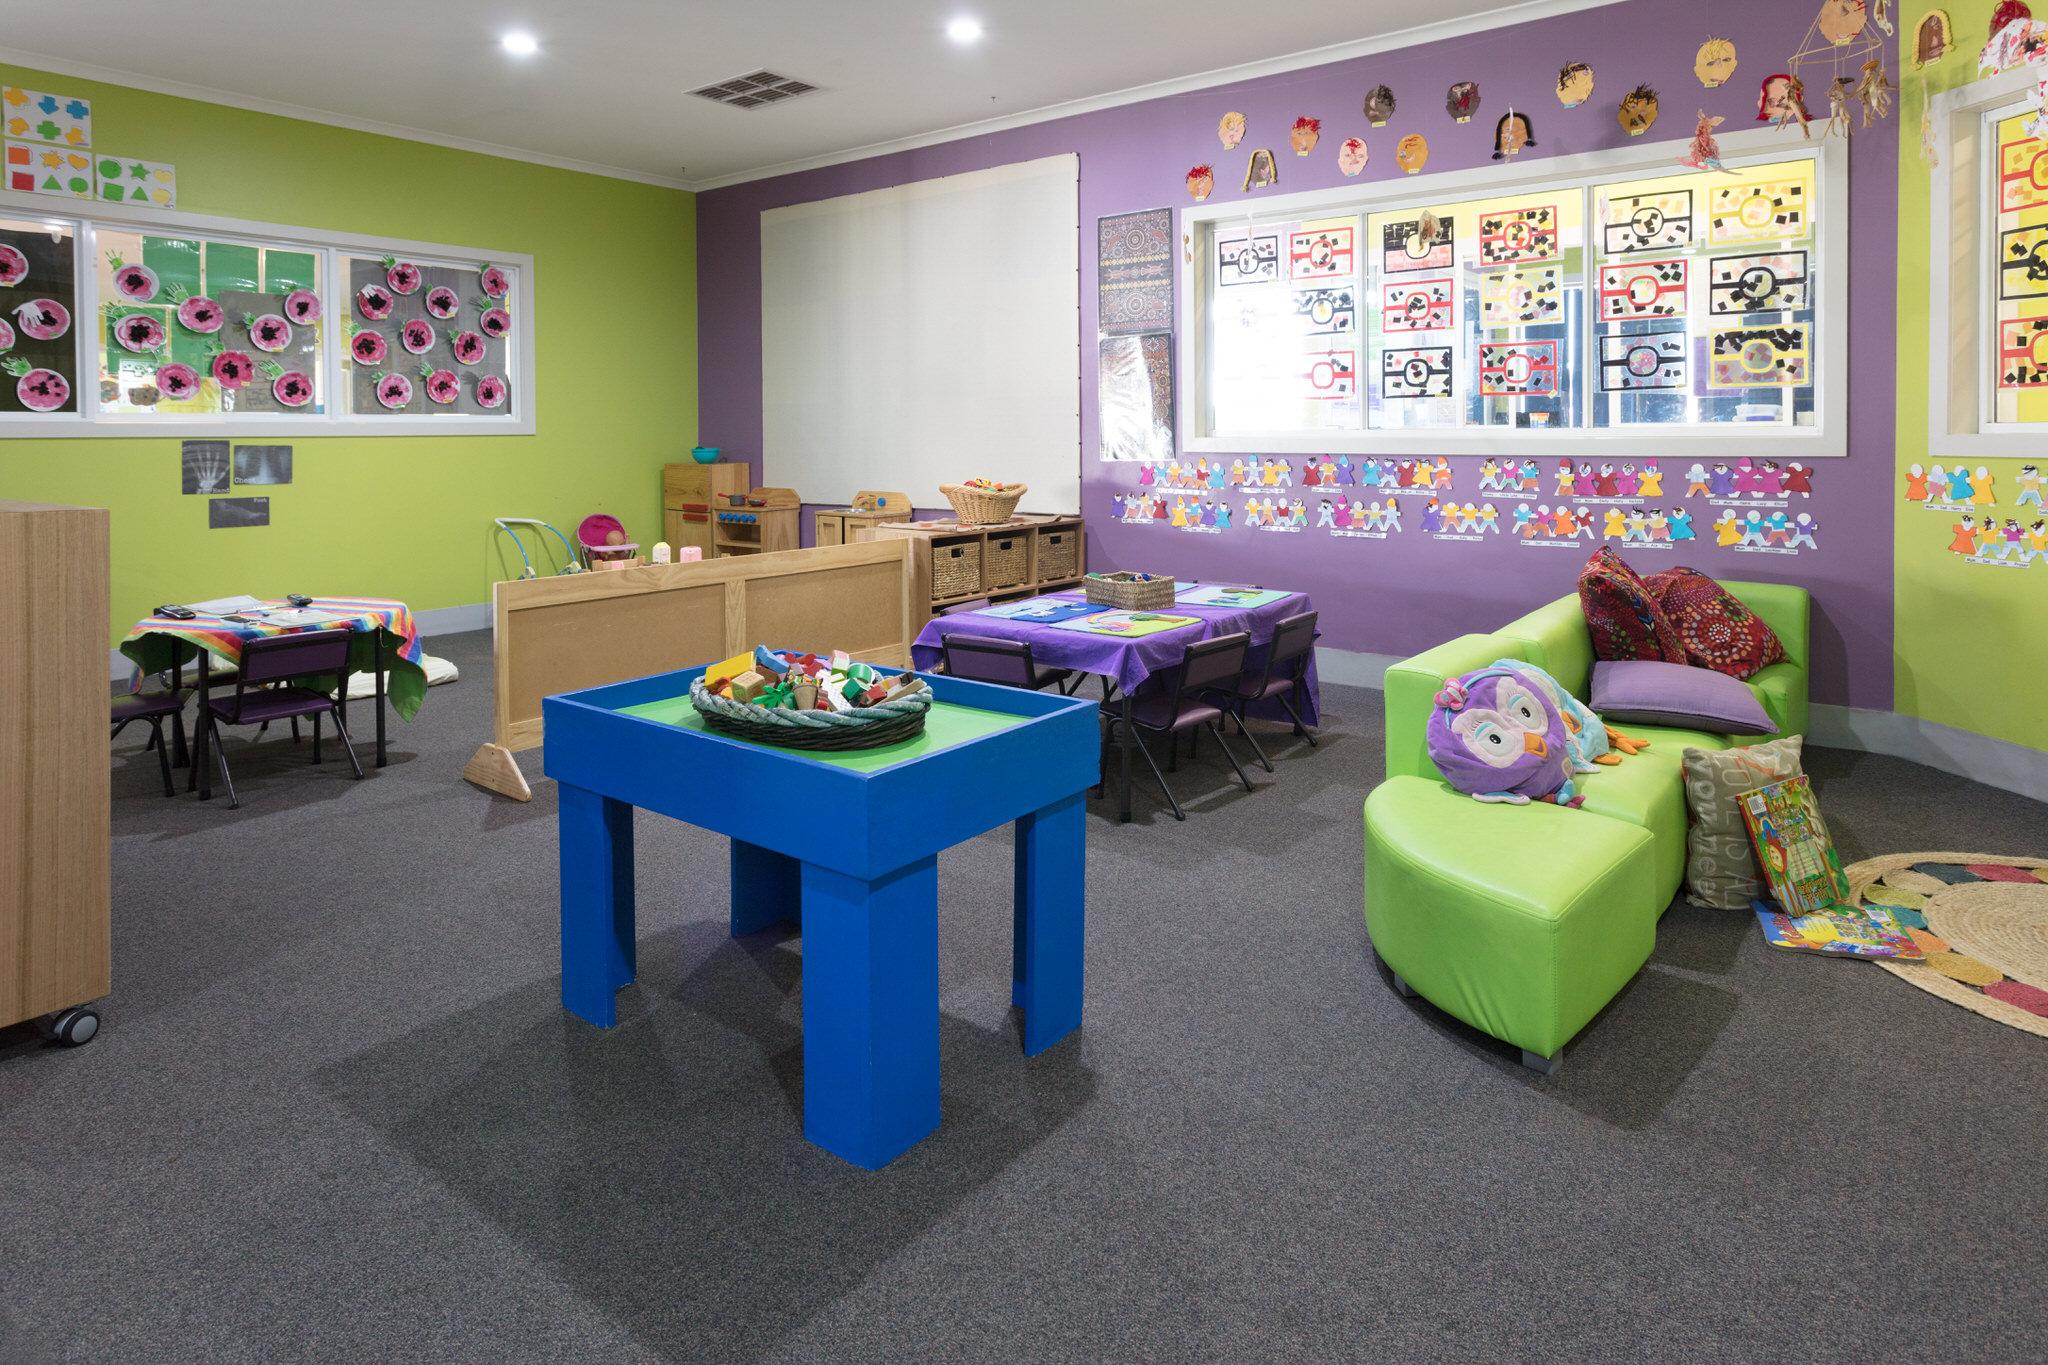 Joeys Room Photo Gallery